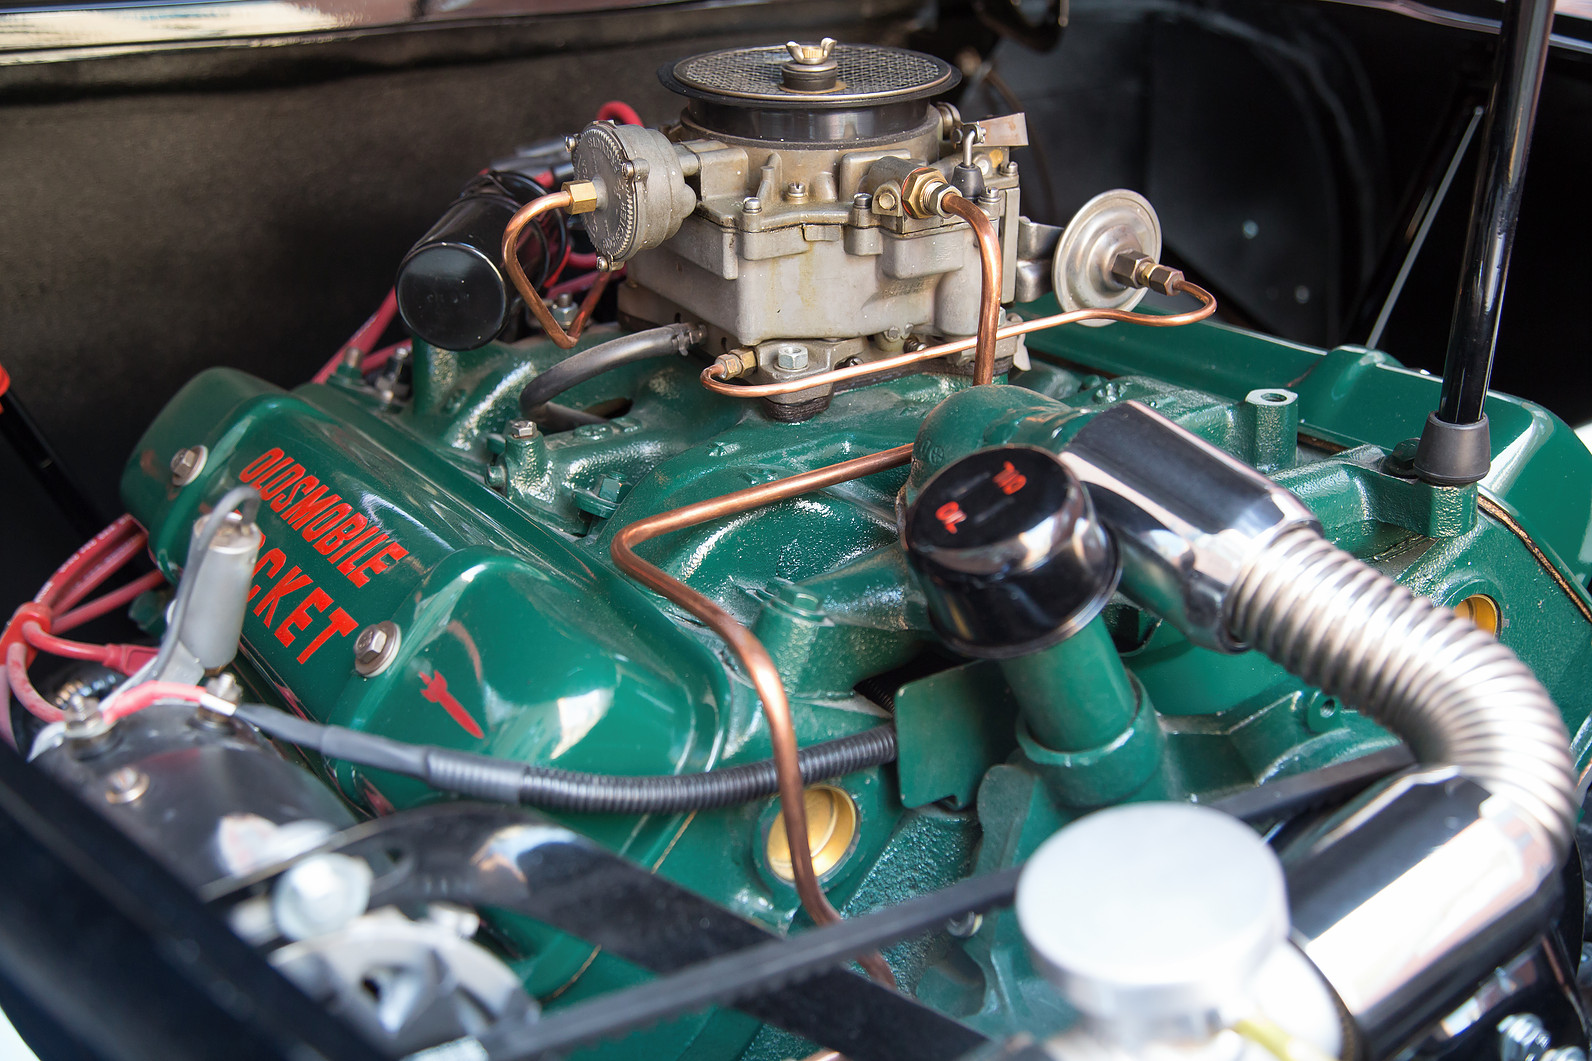 1956 Oldsmobile Rocket 88 Engine used in Batmobile.jpg